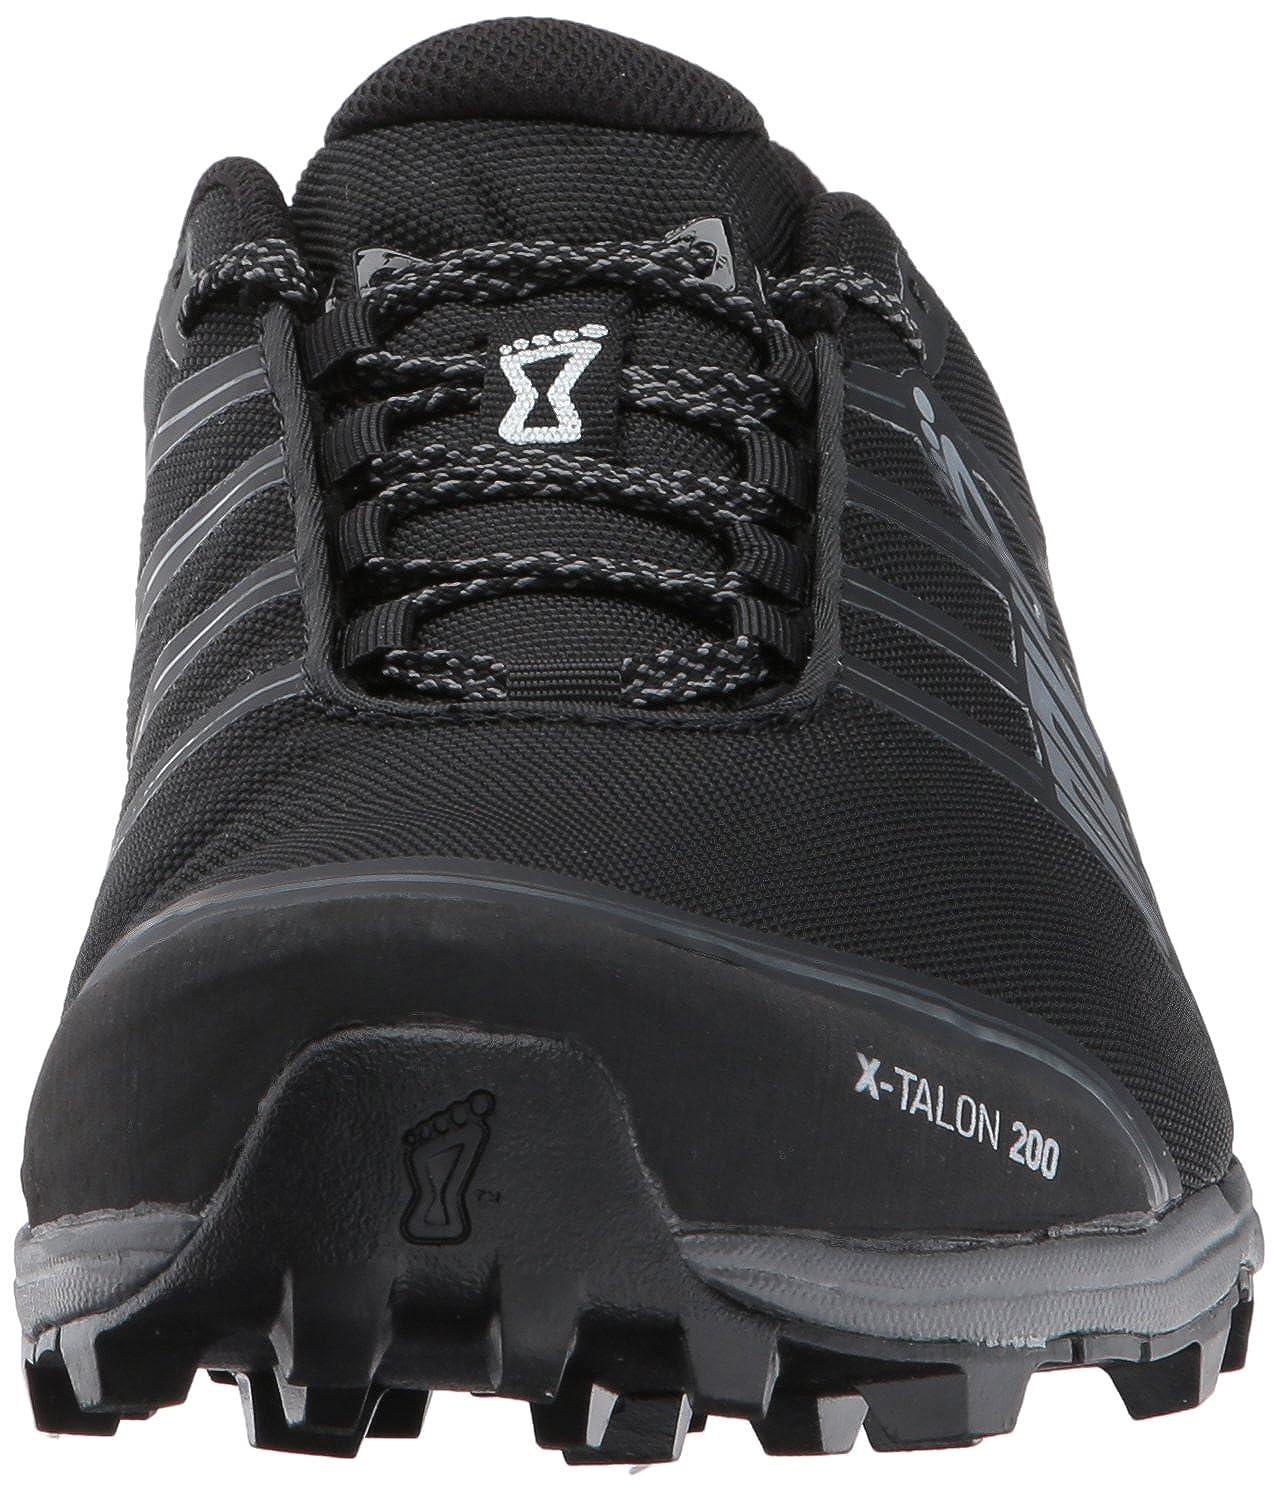 Inov-8 X-Talon 200 Unisex Sneaker